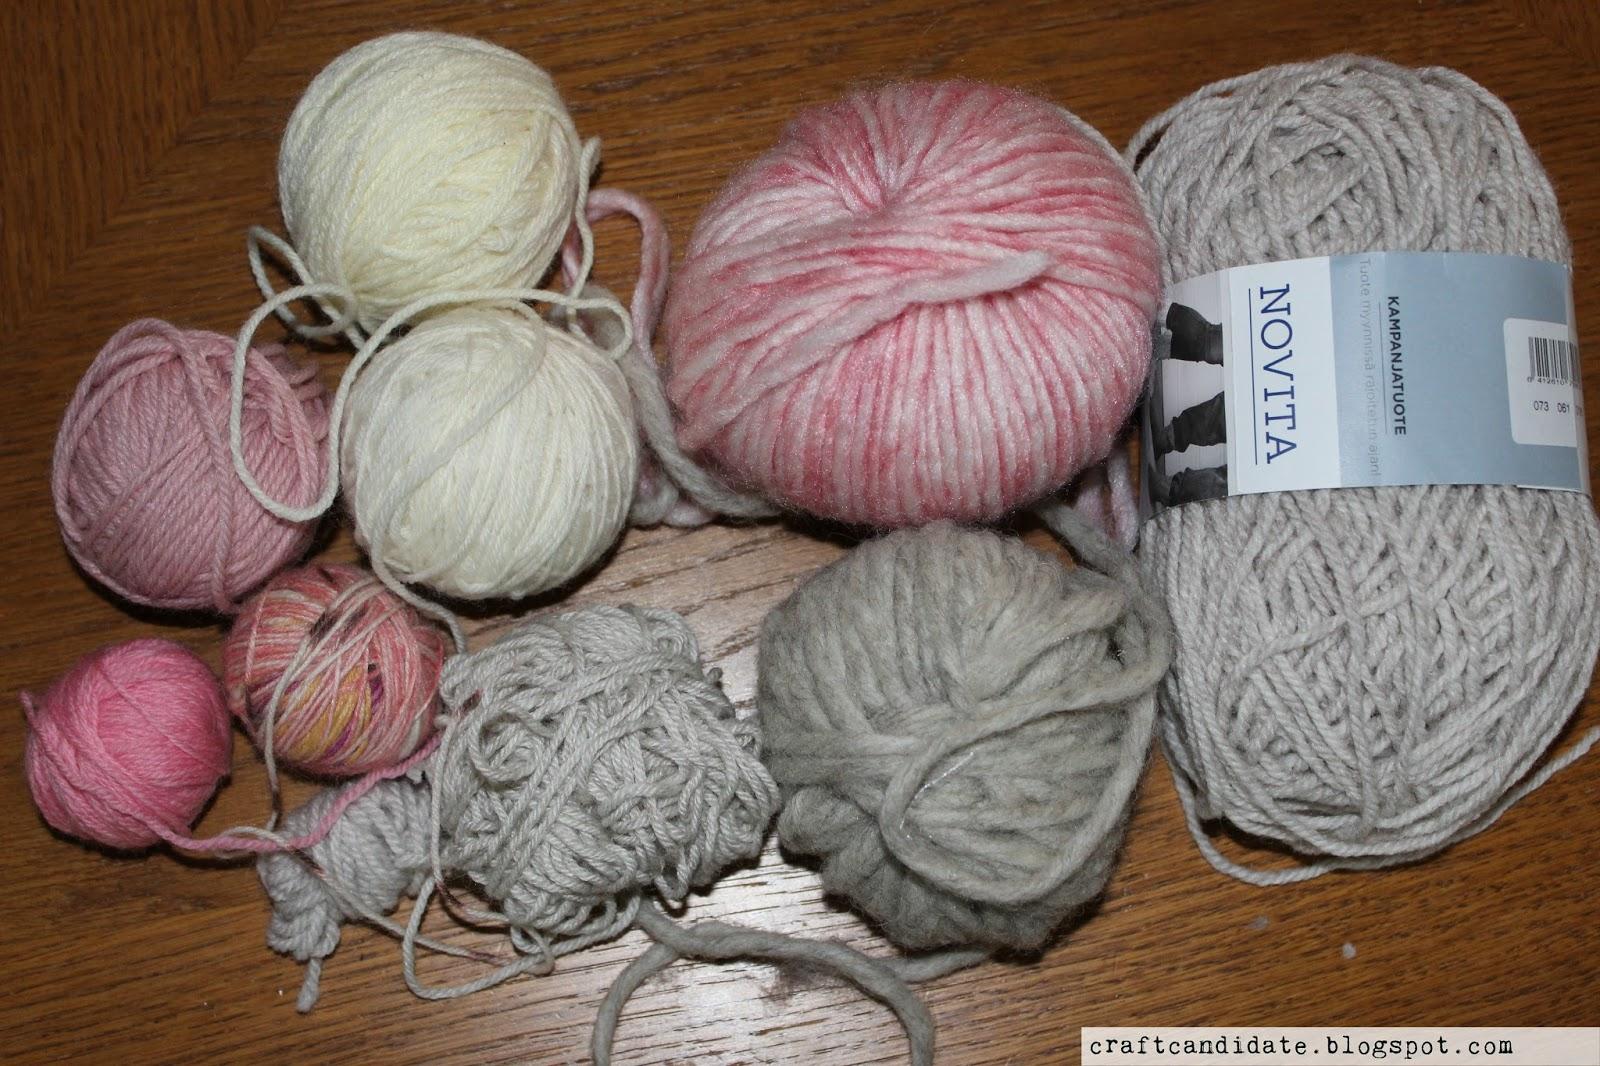 scrap yarn, leftover yarn